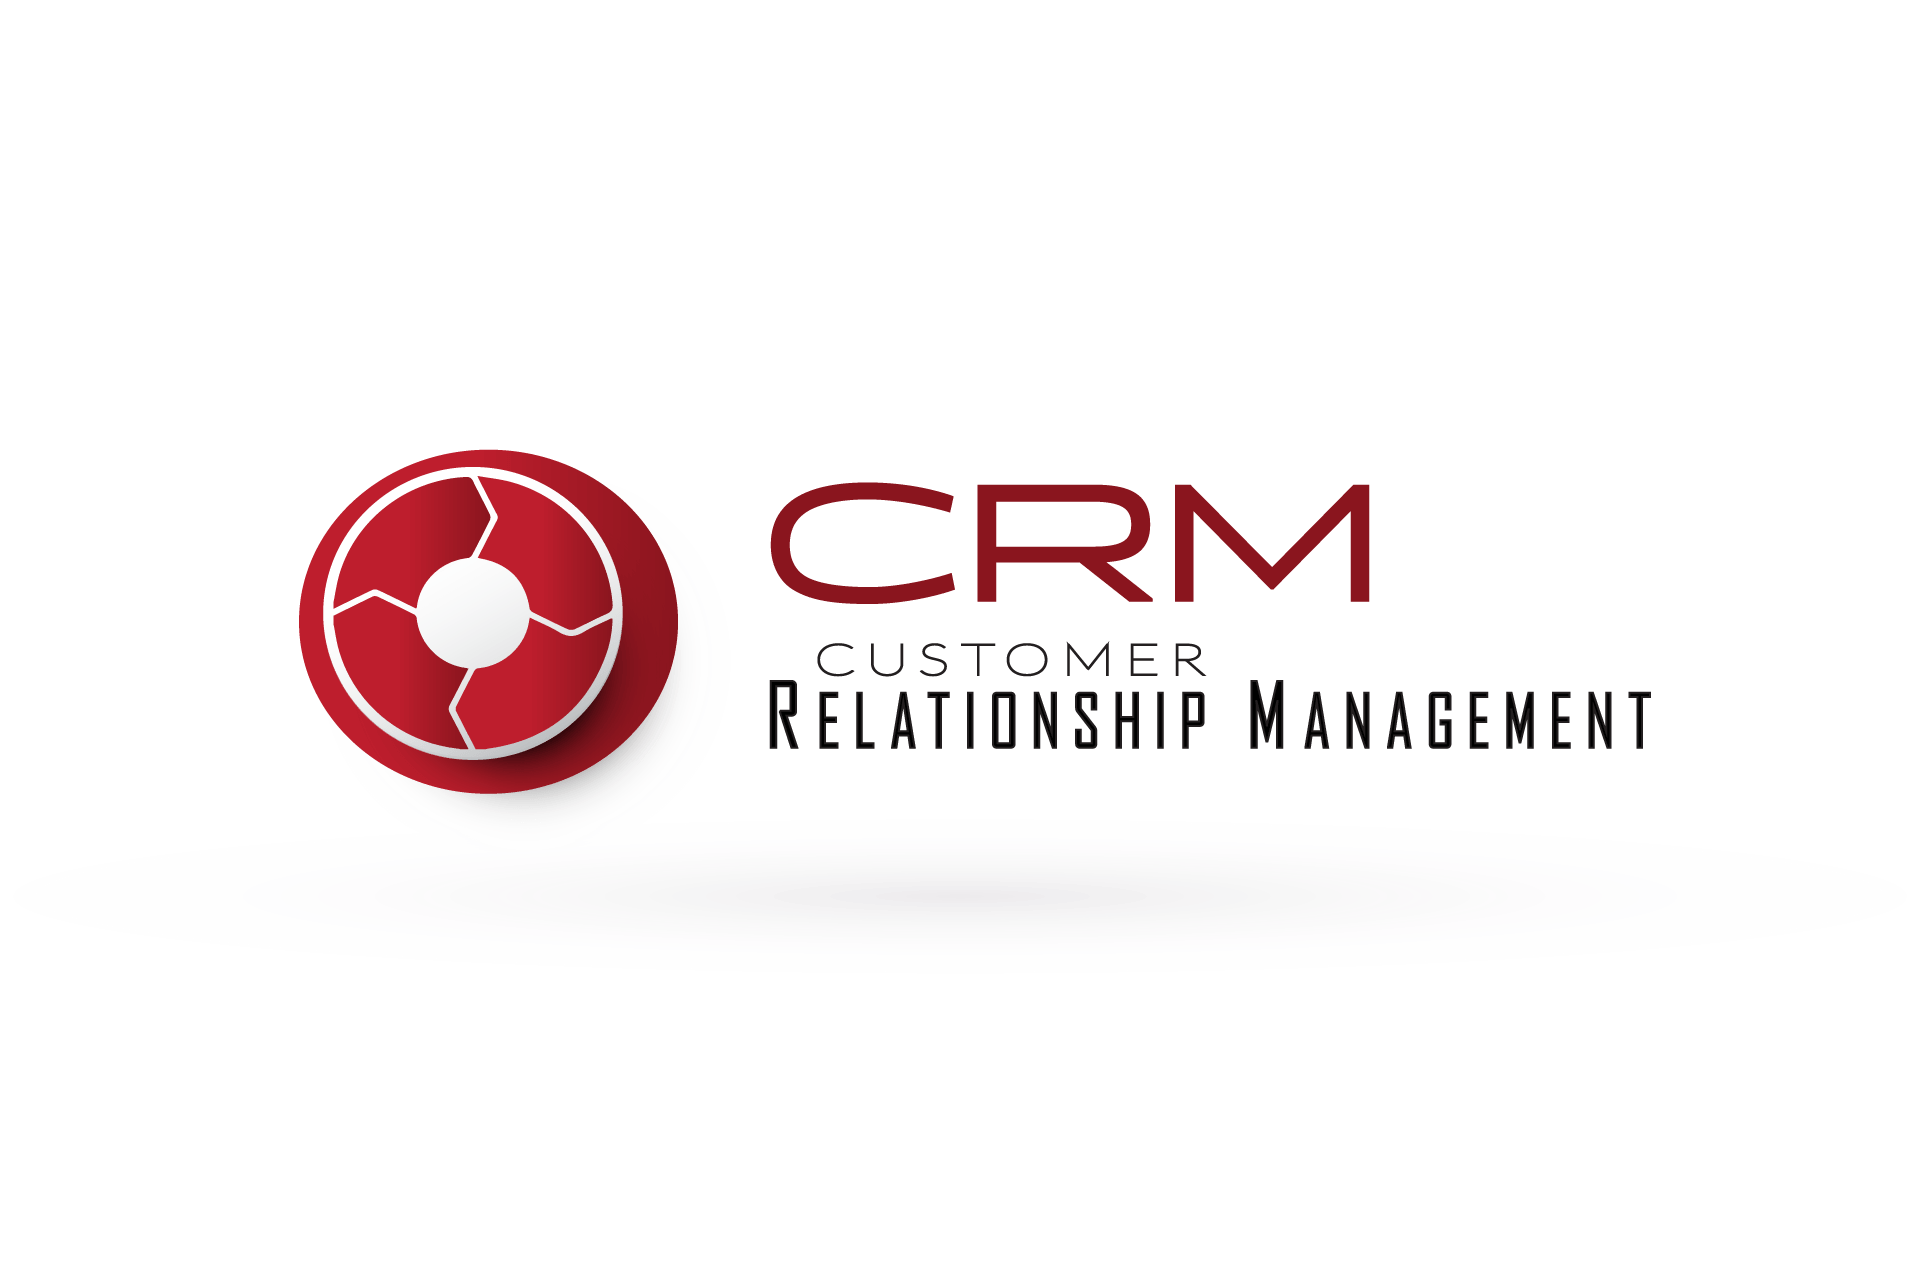 Customer Relationship Management Cover